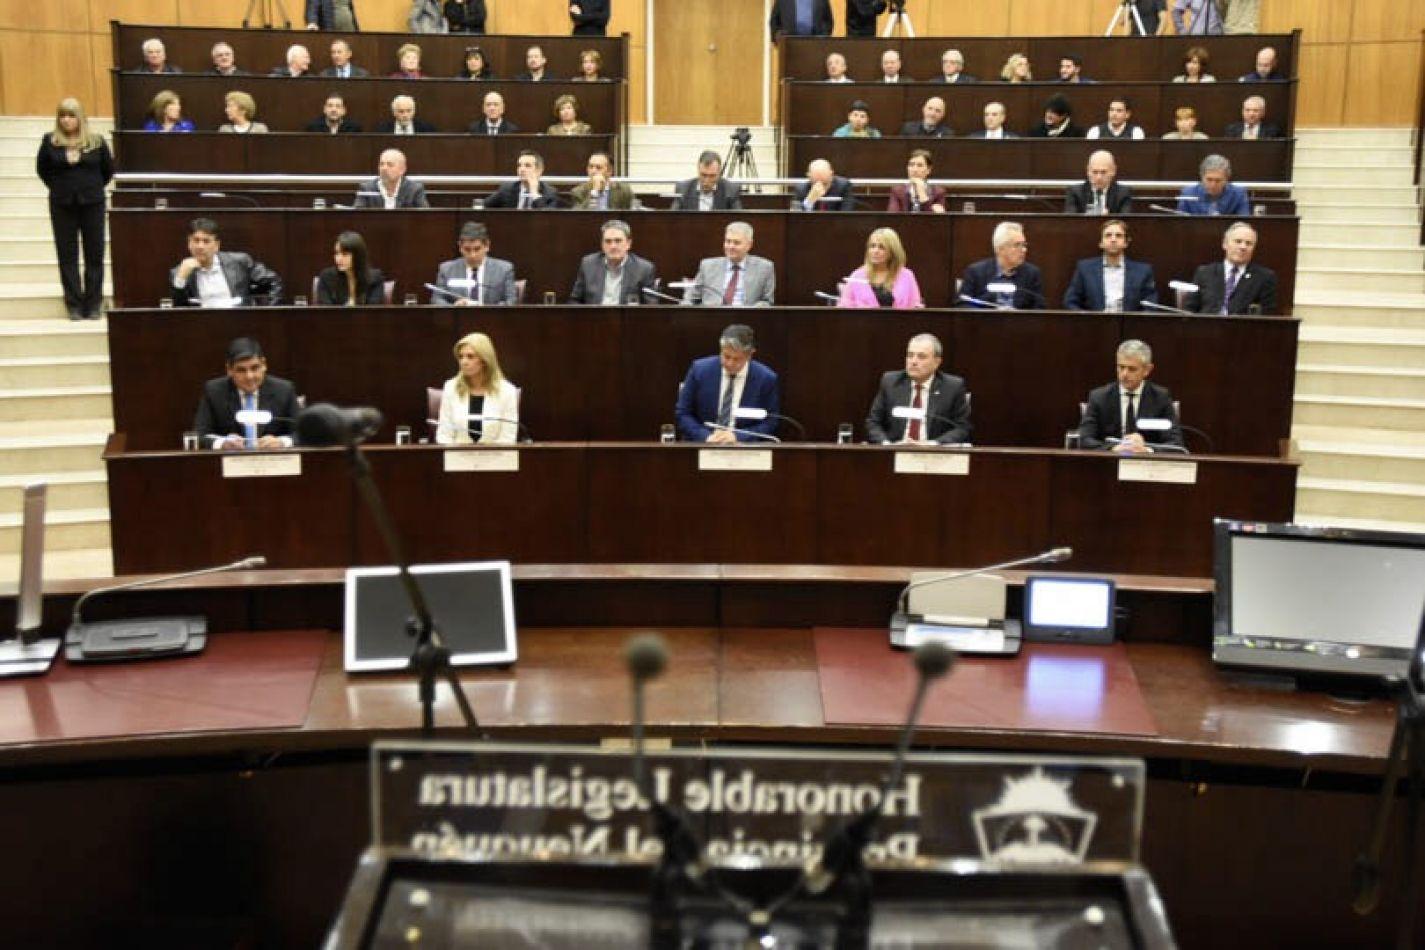 1° Encuentro Federal de Vicegobernadores de la República Argentina